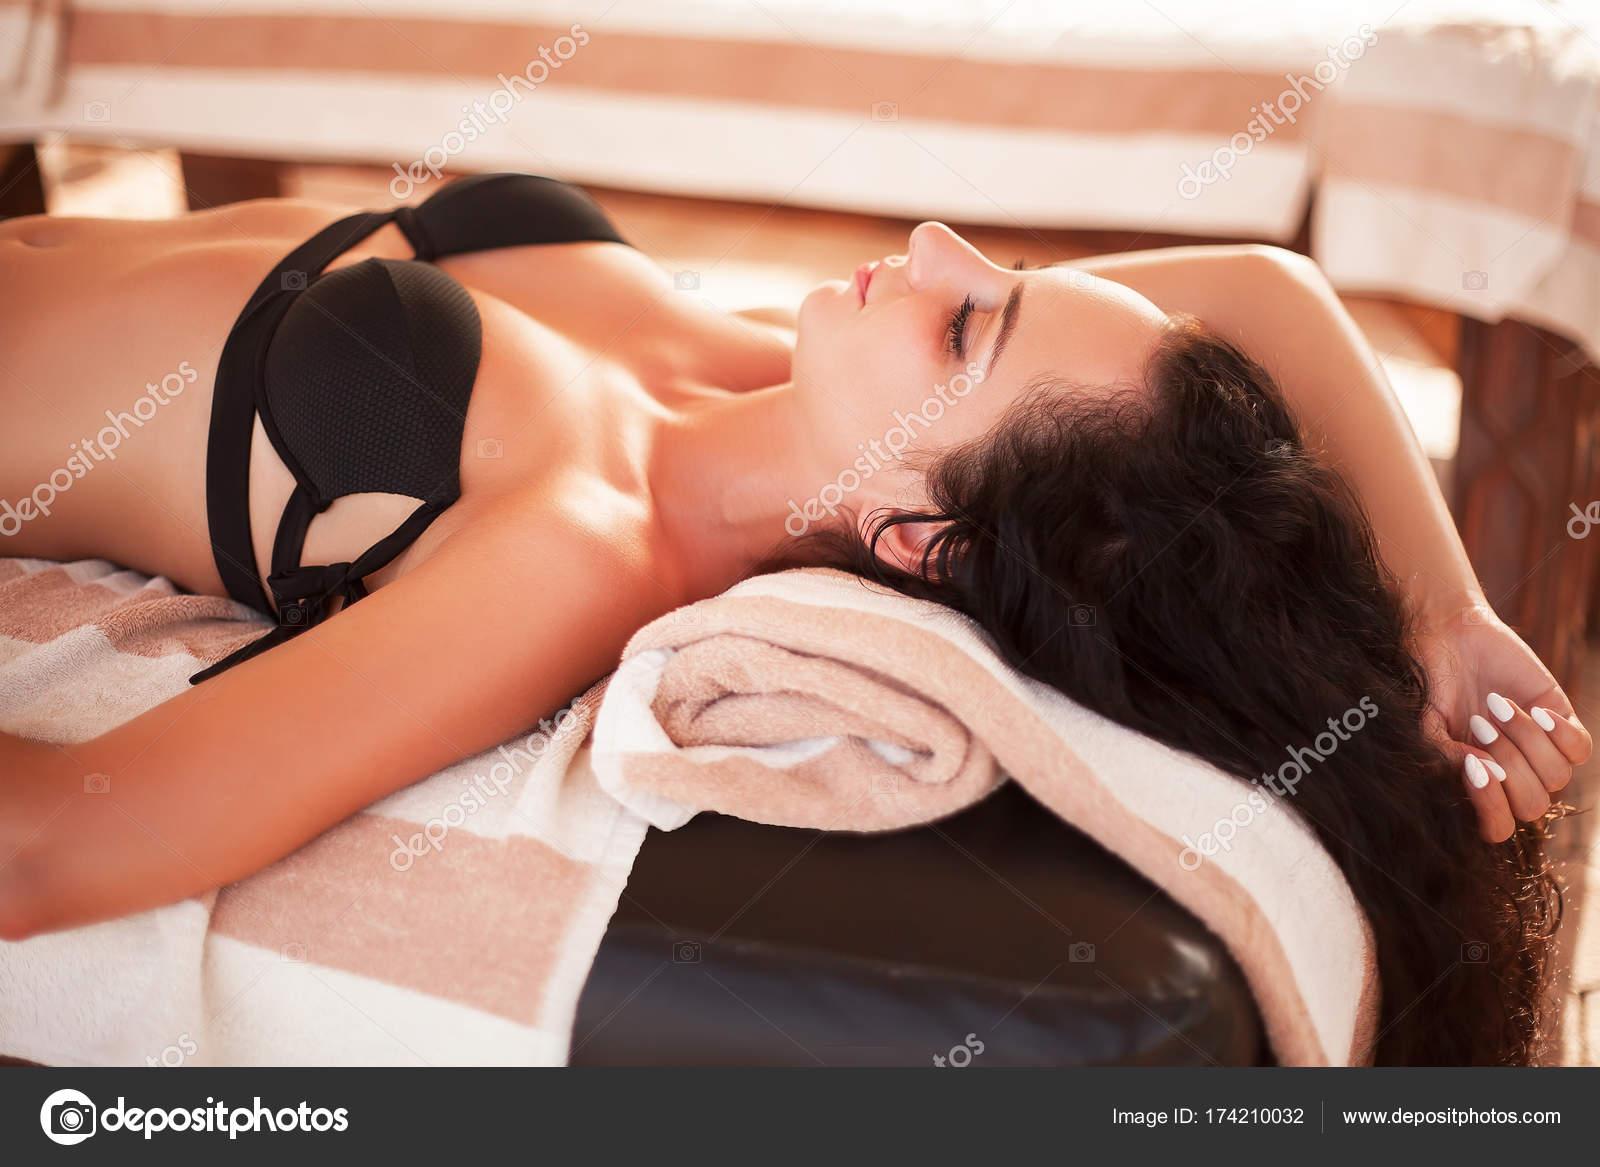 dorcel nuru massage malmö